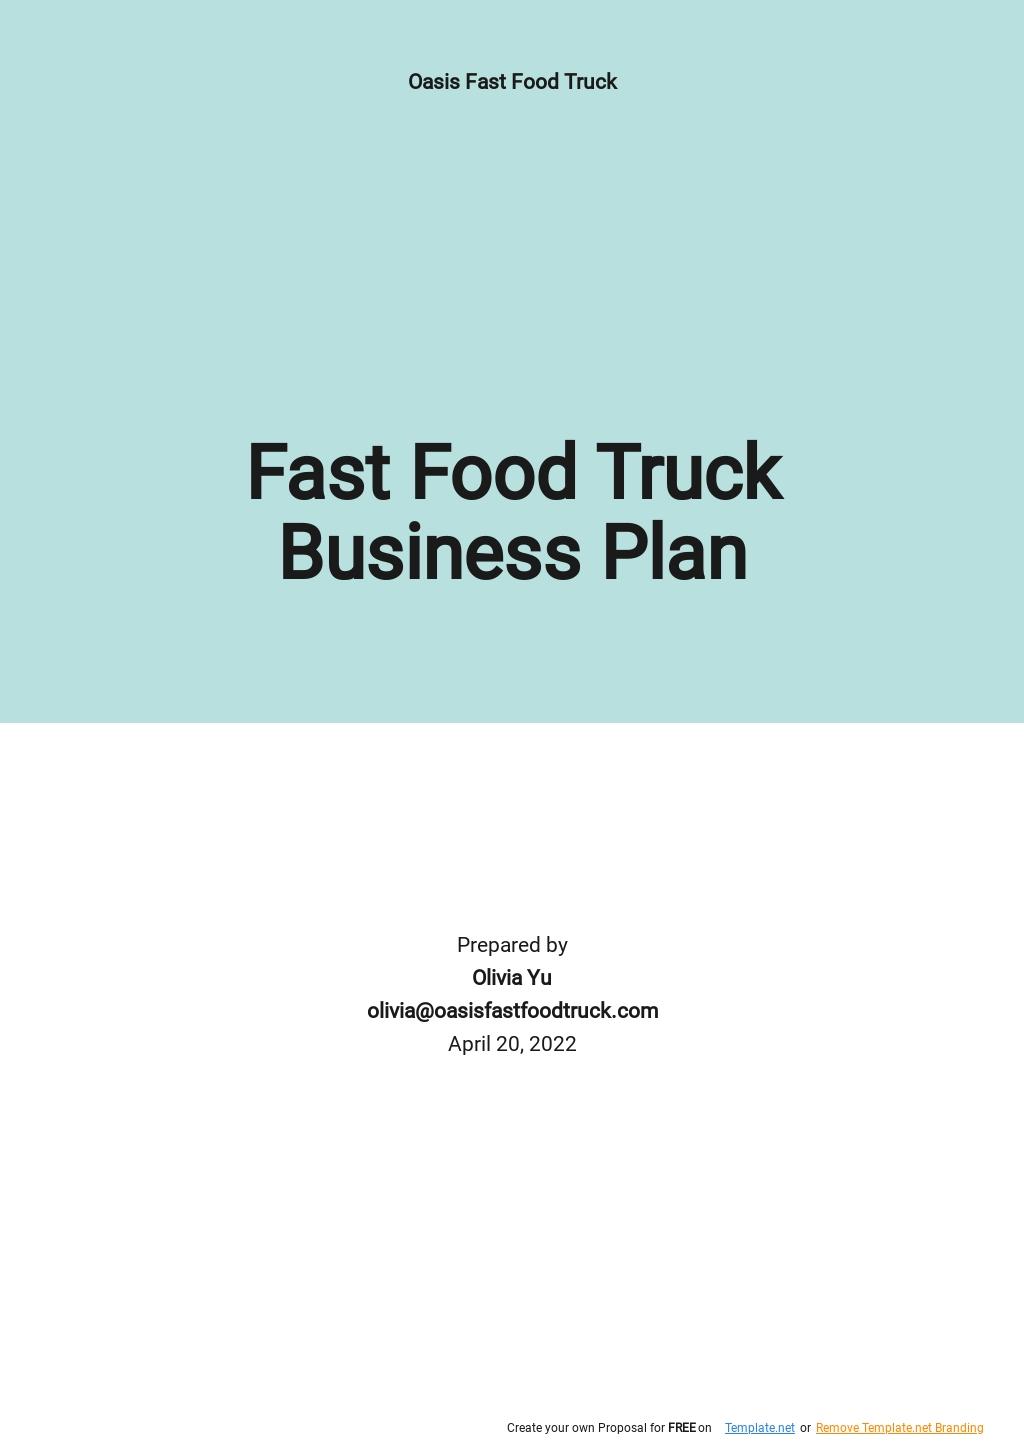 Fast Food Truck Business Plan Sample.jpe